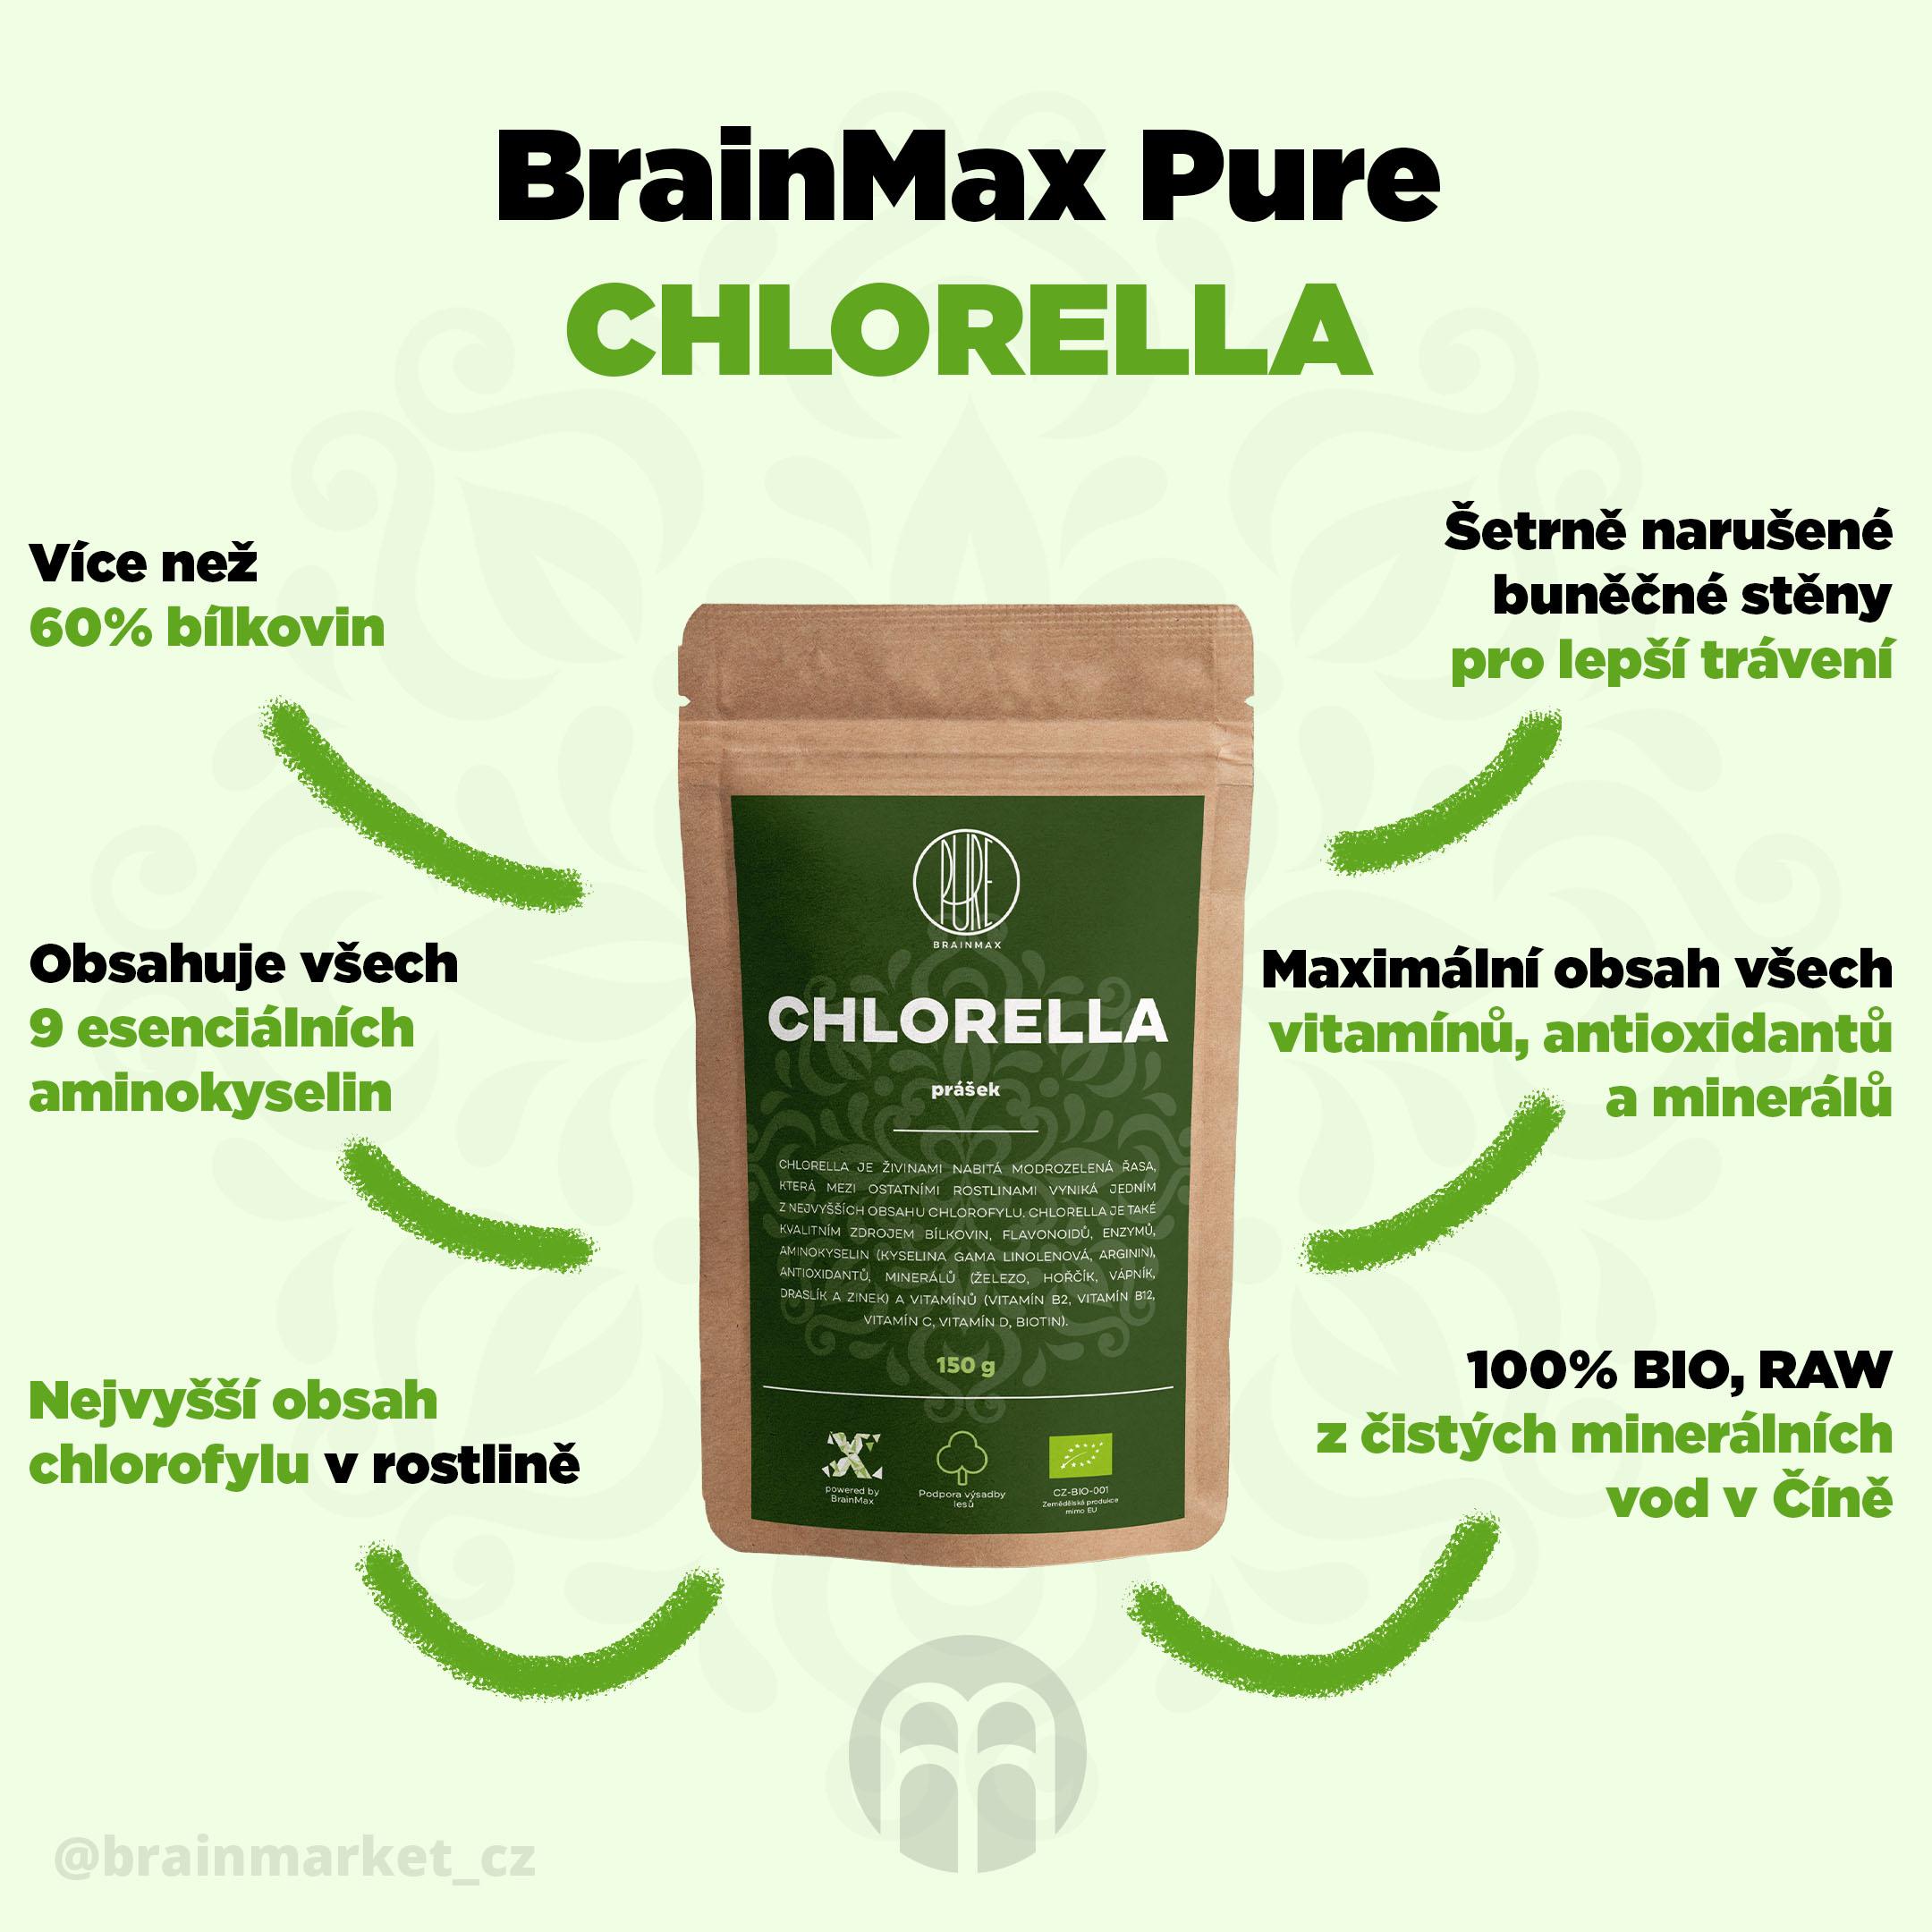 chlorella-infografika-brainmarket-cz